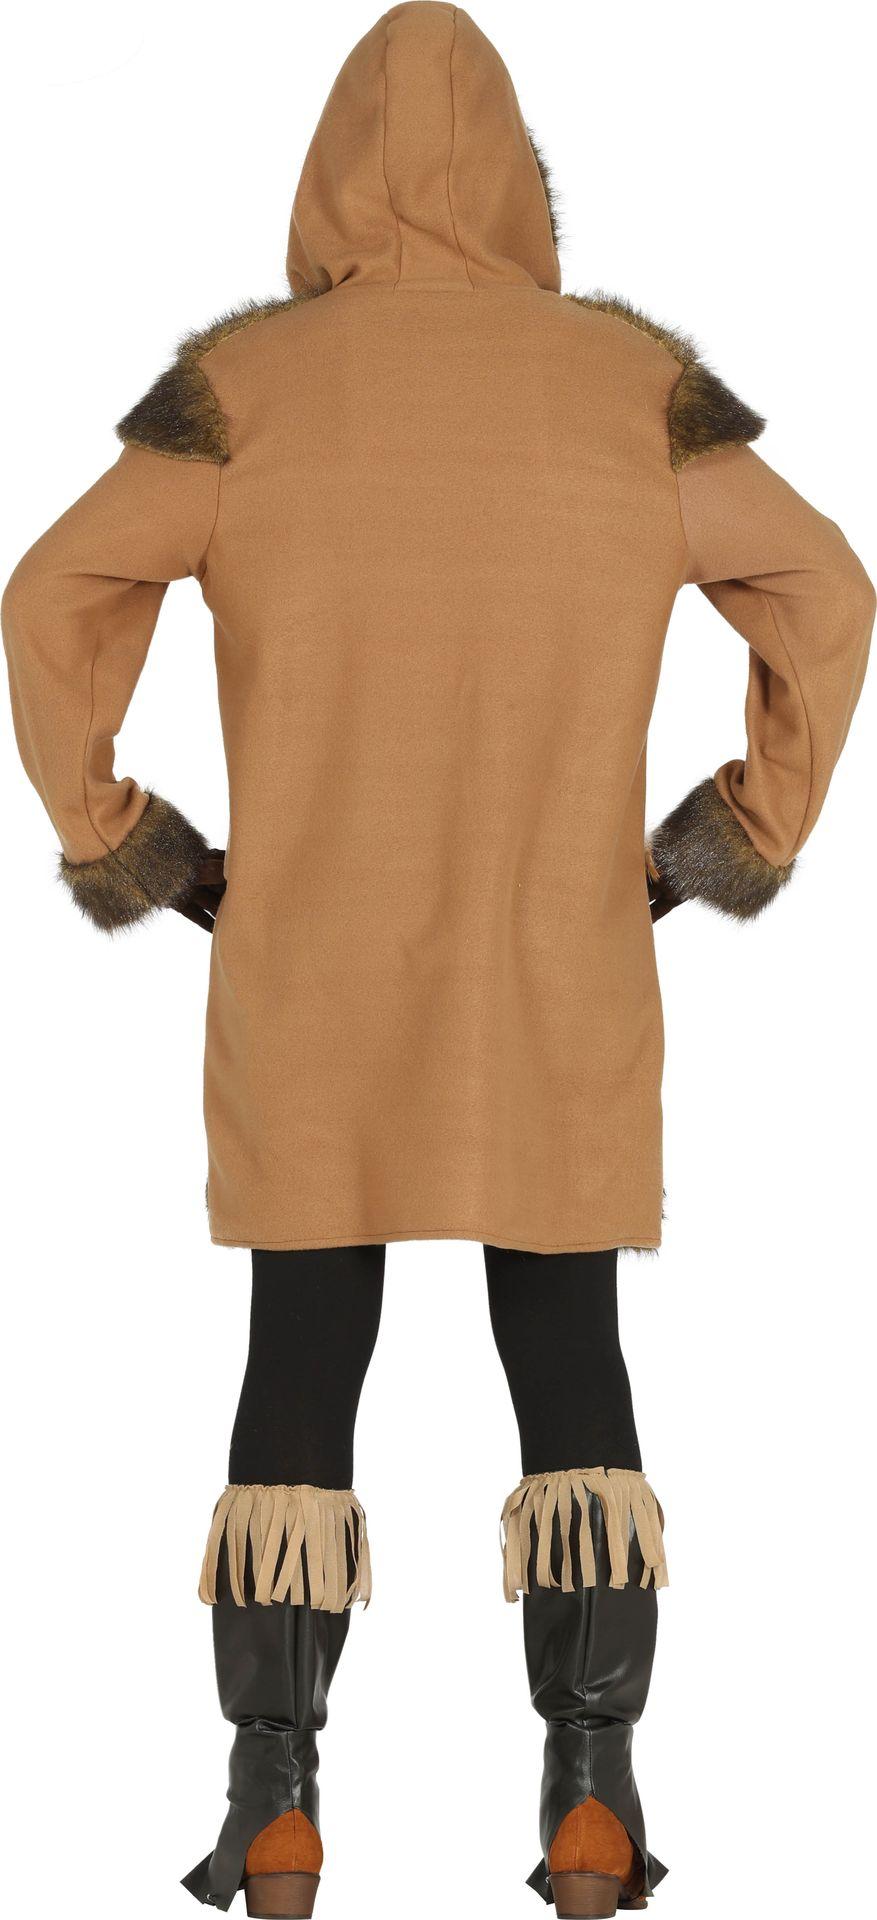 Eskimo outfit dames